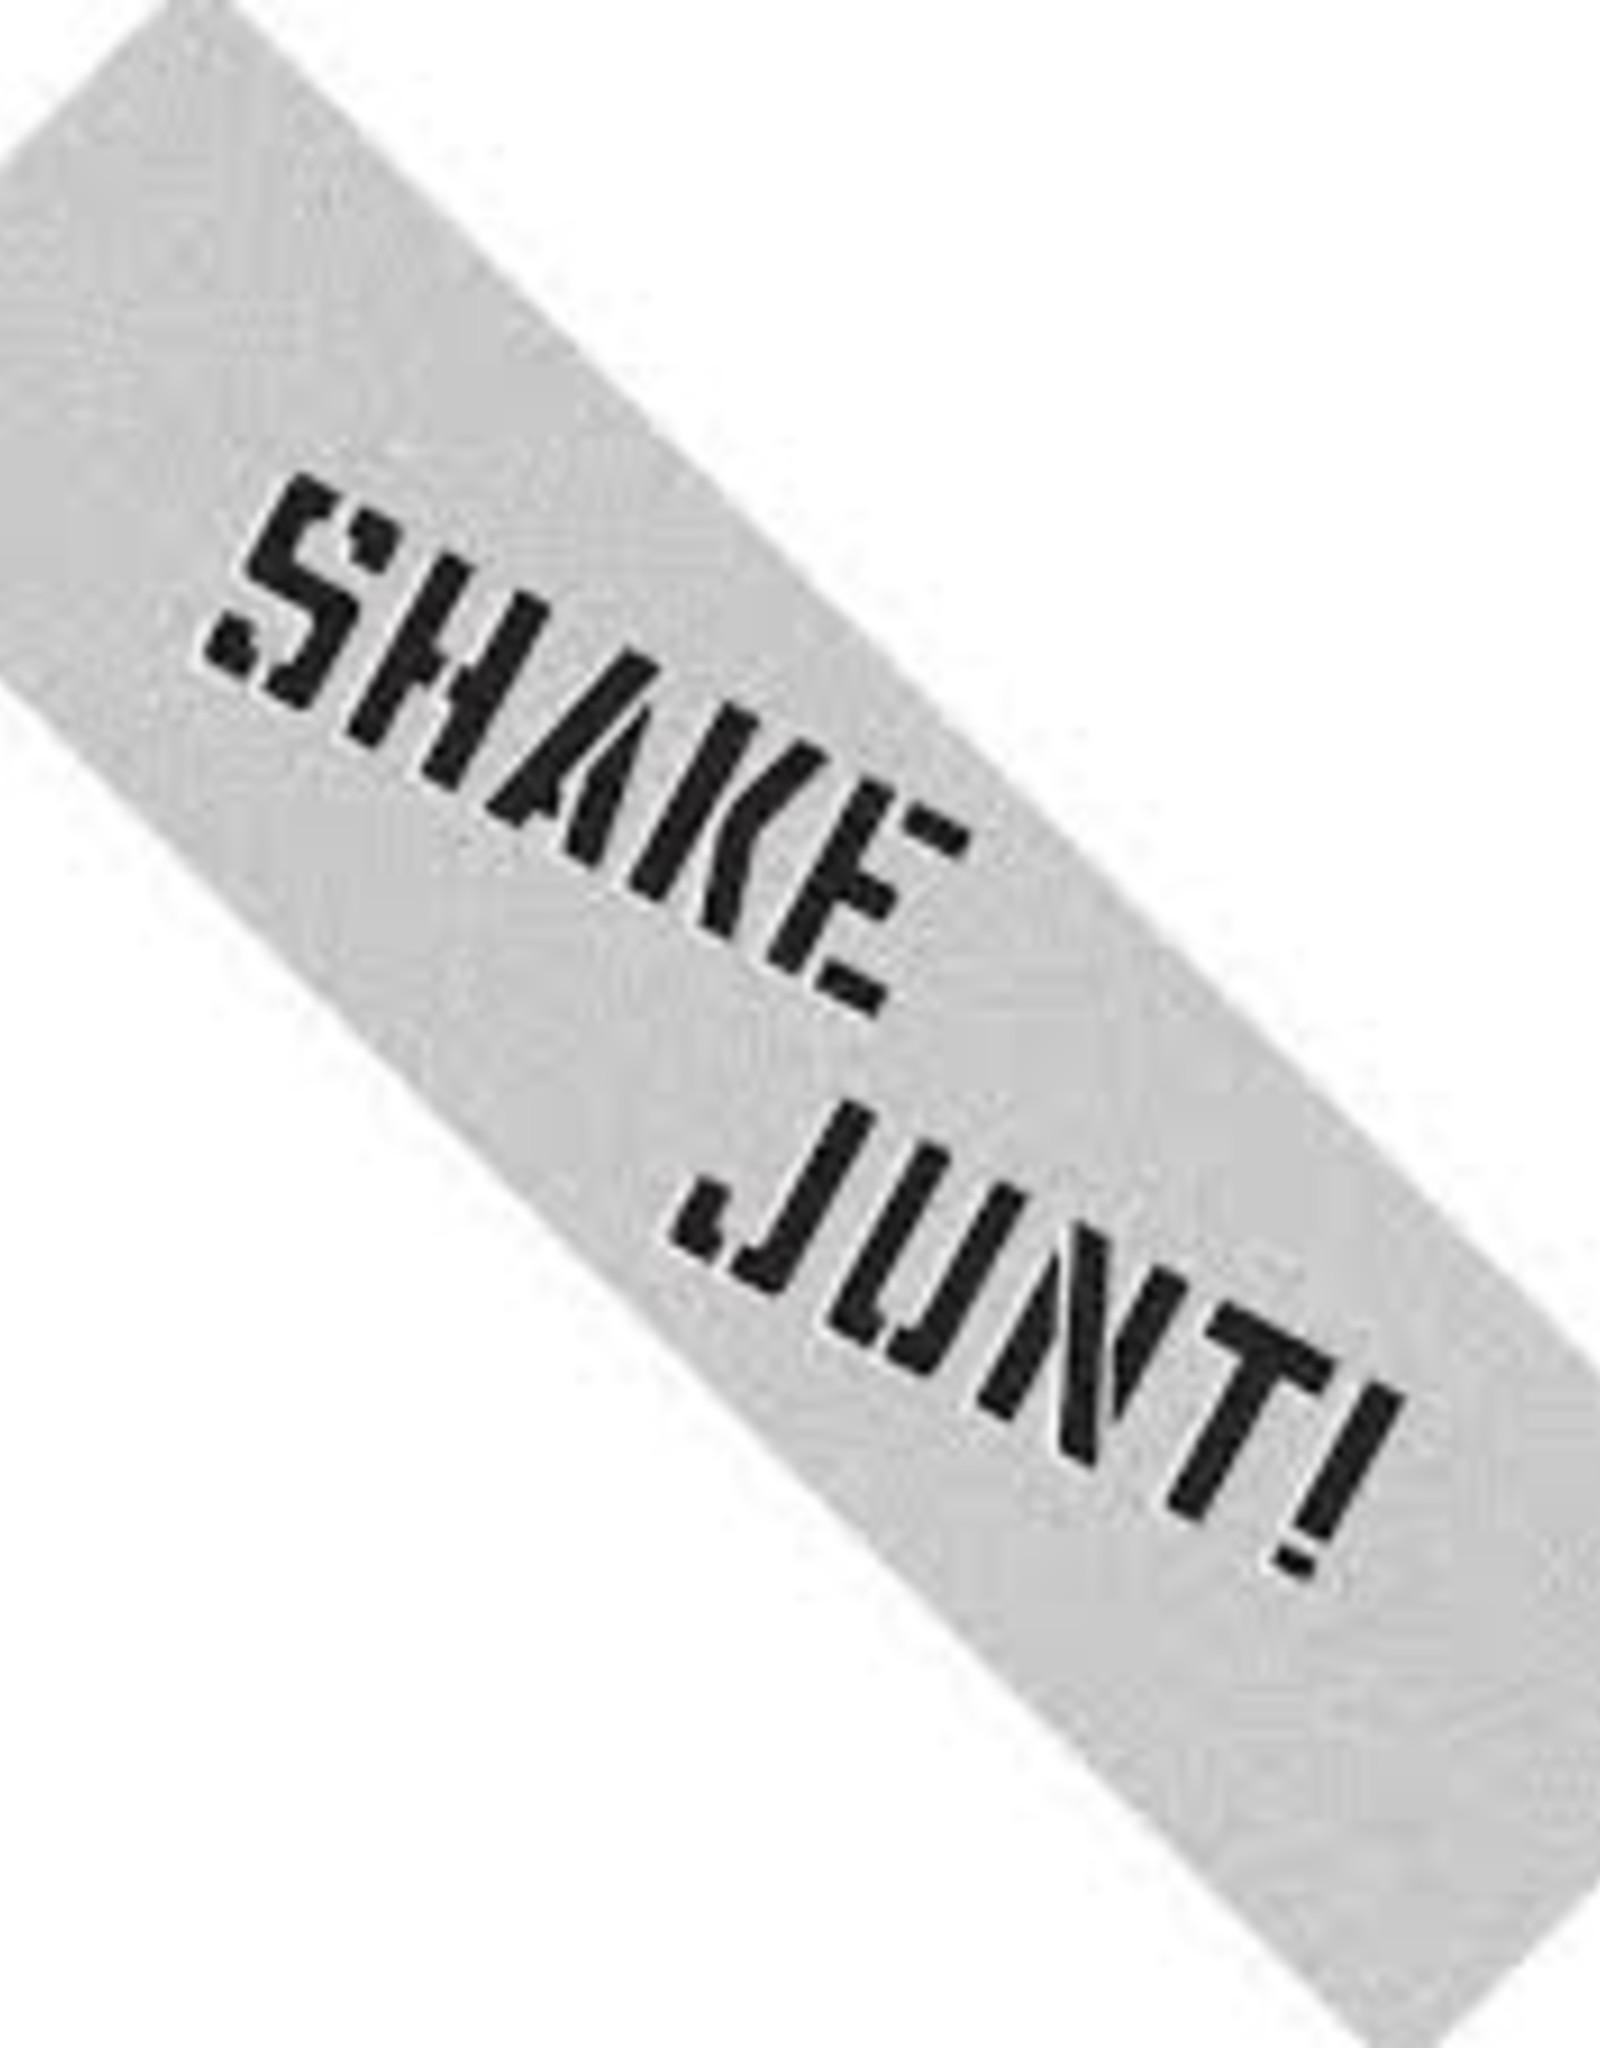 Shake Junt SHAKE JUNT Clear Grip Tape